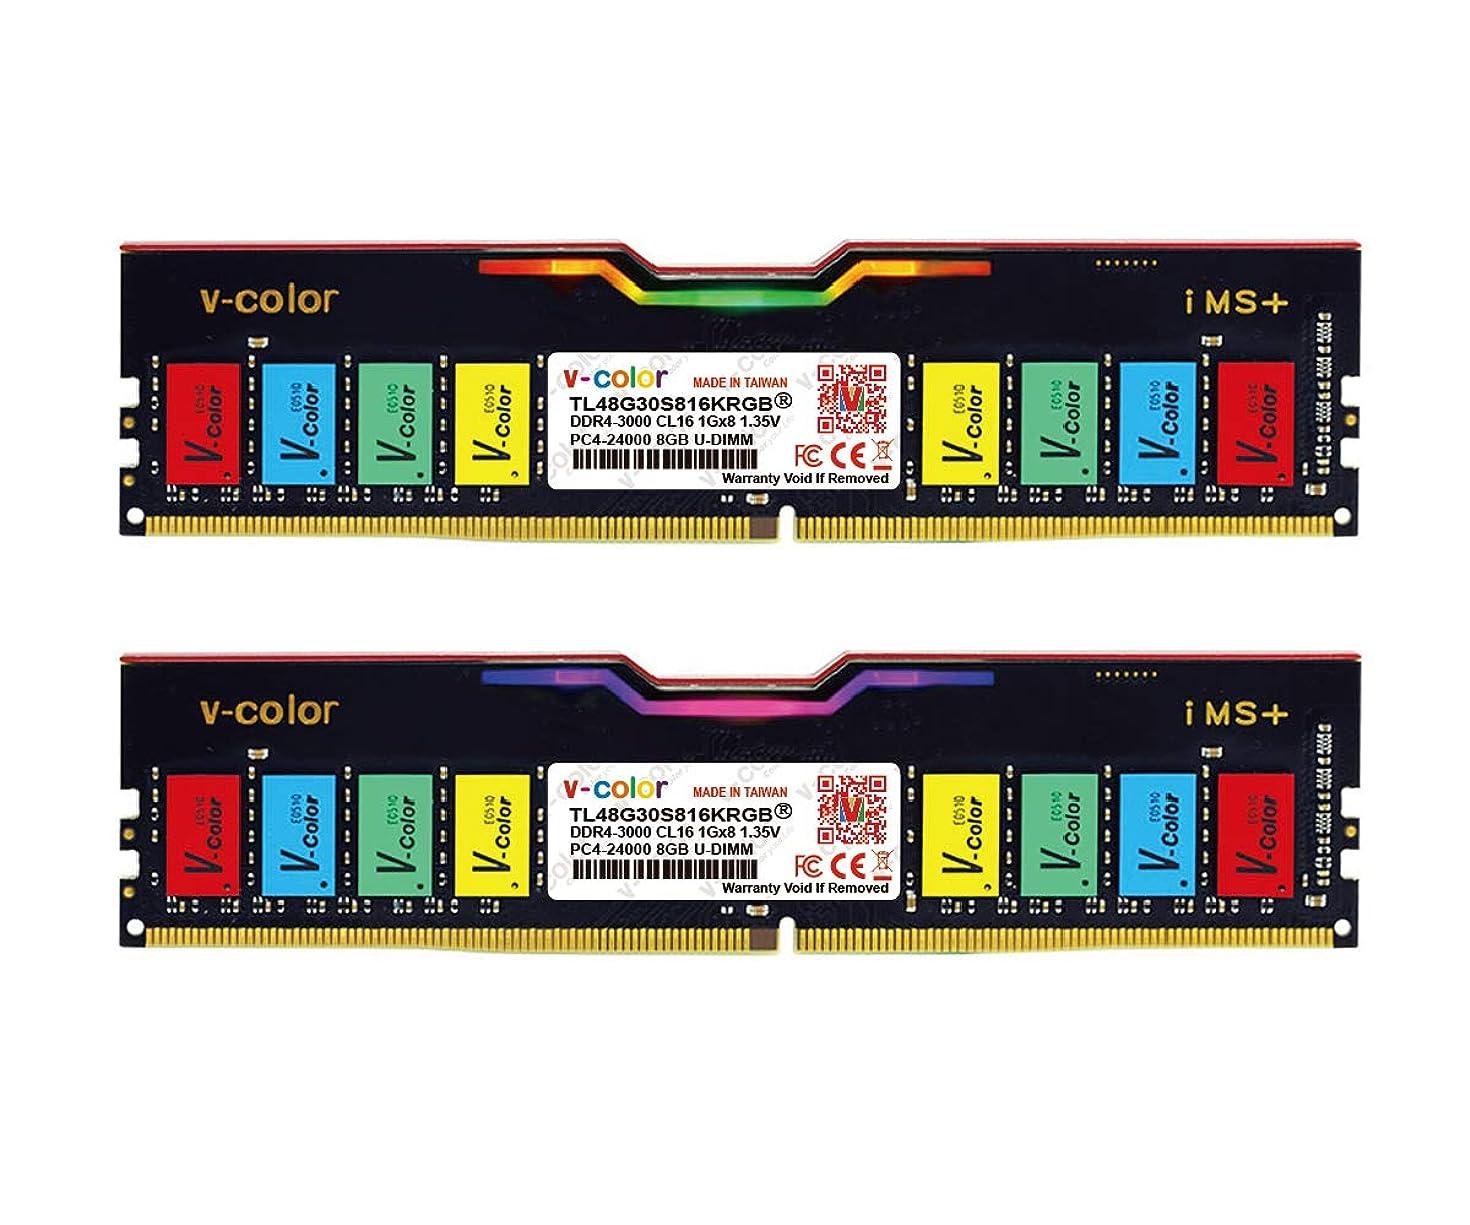 V-Color Skywalker RGB 16GB (2 x 8GB) DDR4 Hynix IC 288-Pin DRAM 3000MHz (PC4-24000) CL16 1.35V Desktop Memory Model (TL48G30S816KRGB)